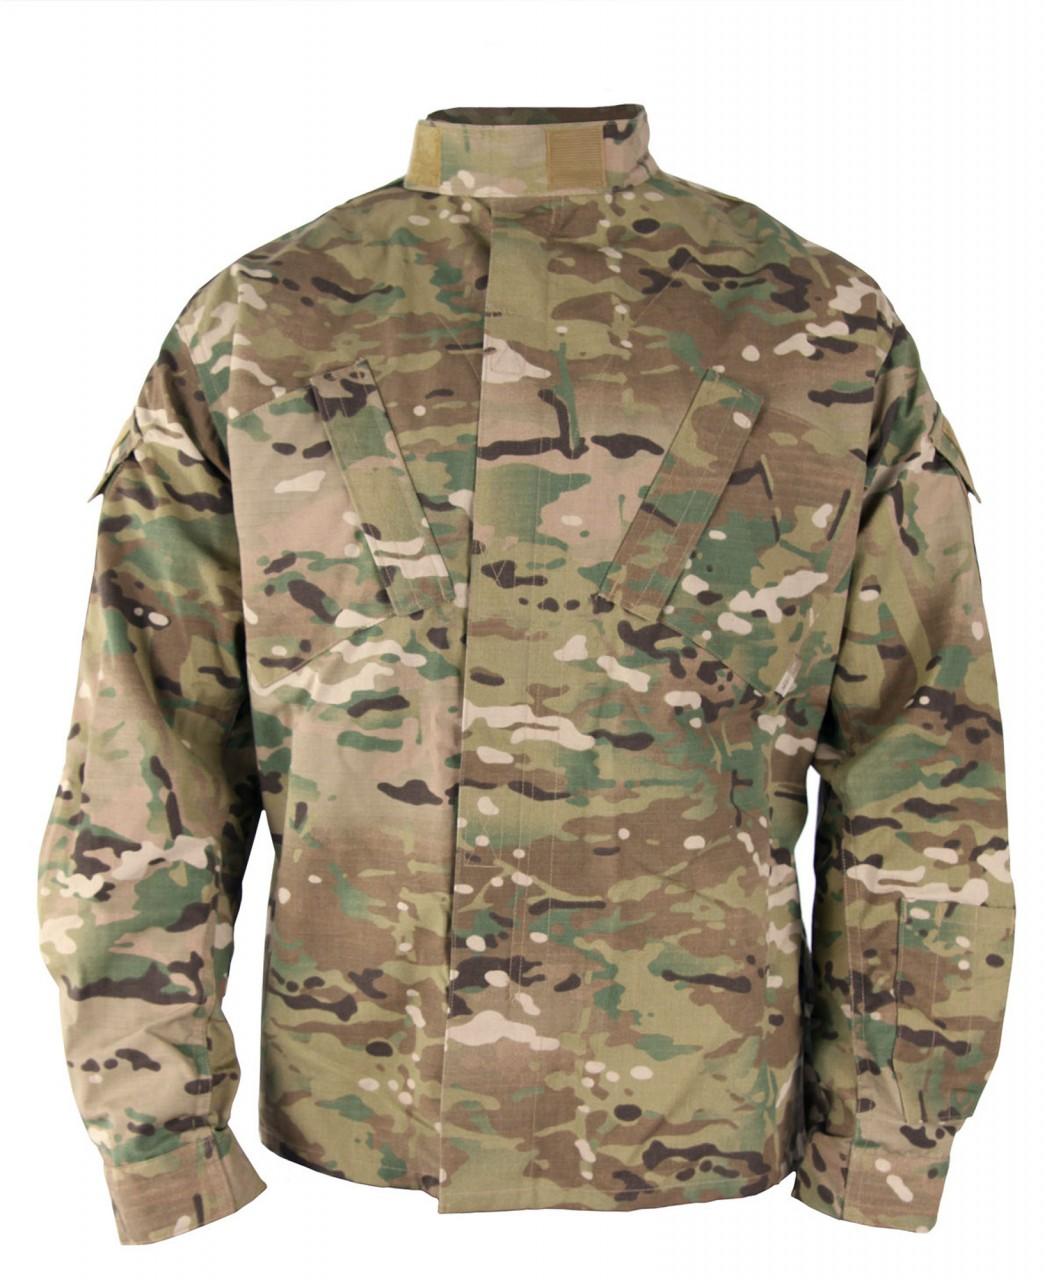 New Army Multicam Uniform 47